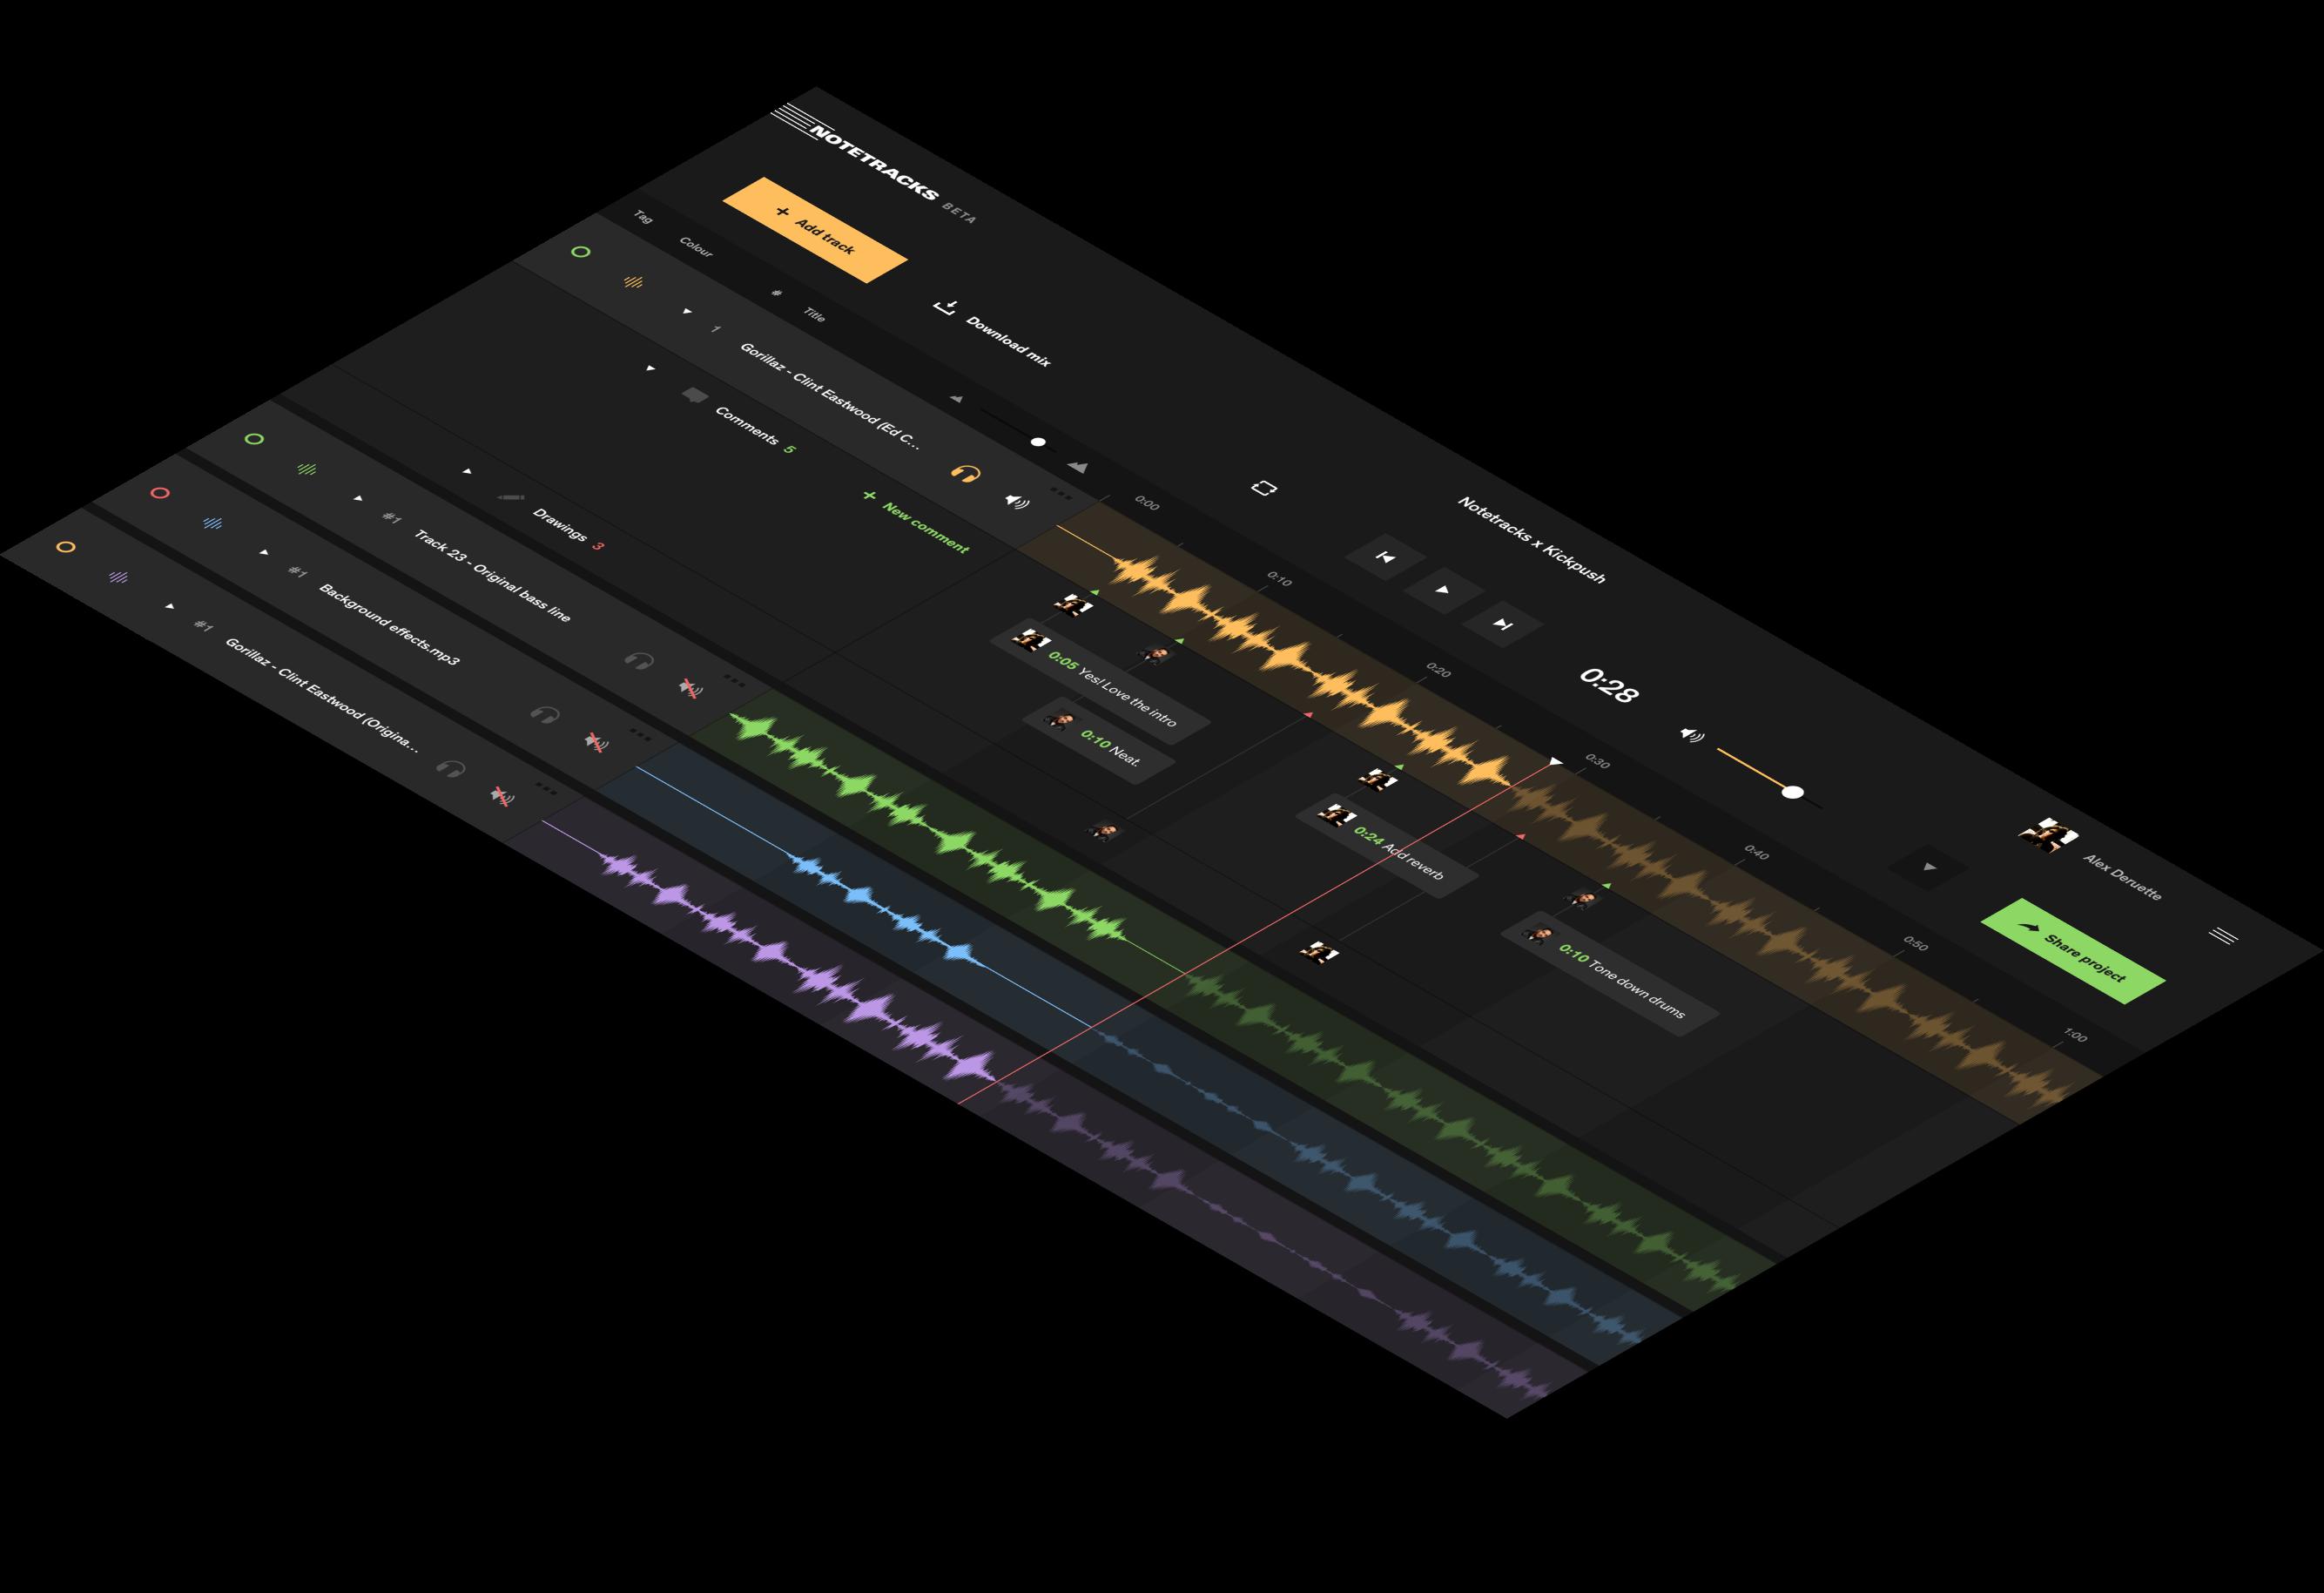 screenview of Notetracks app.